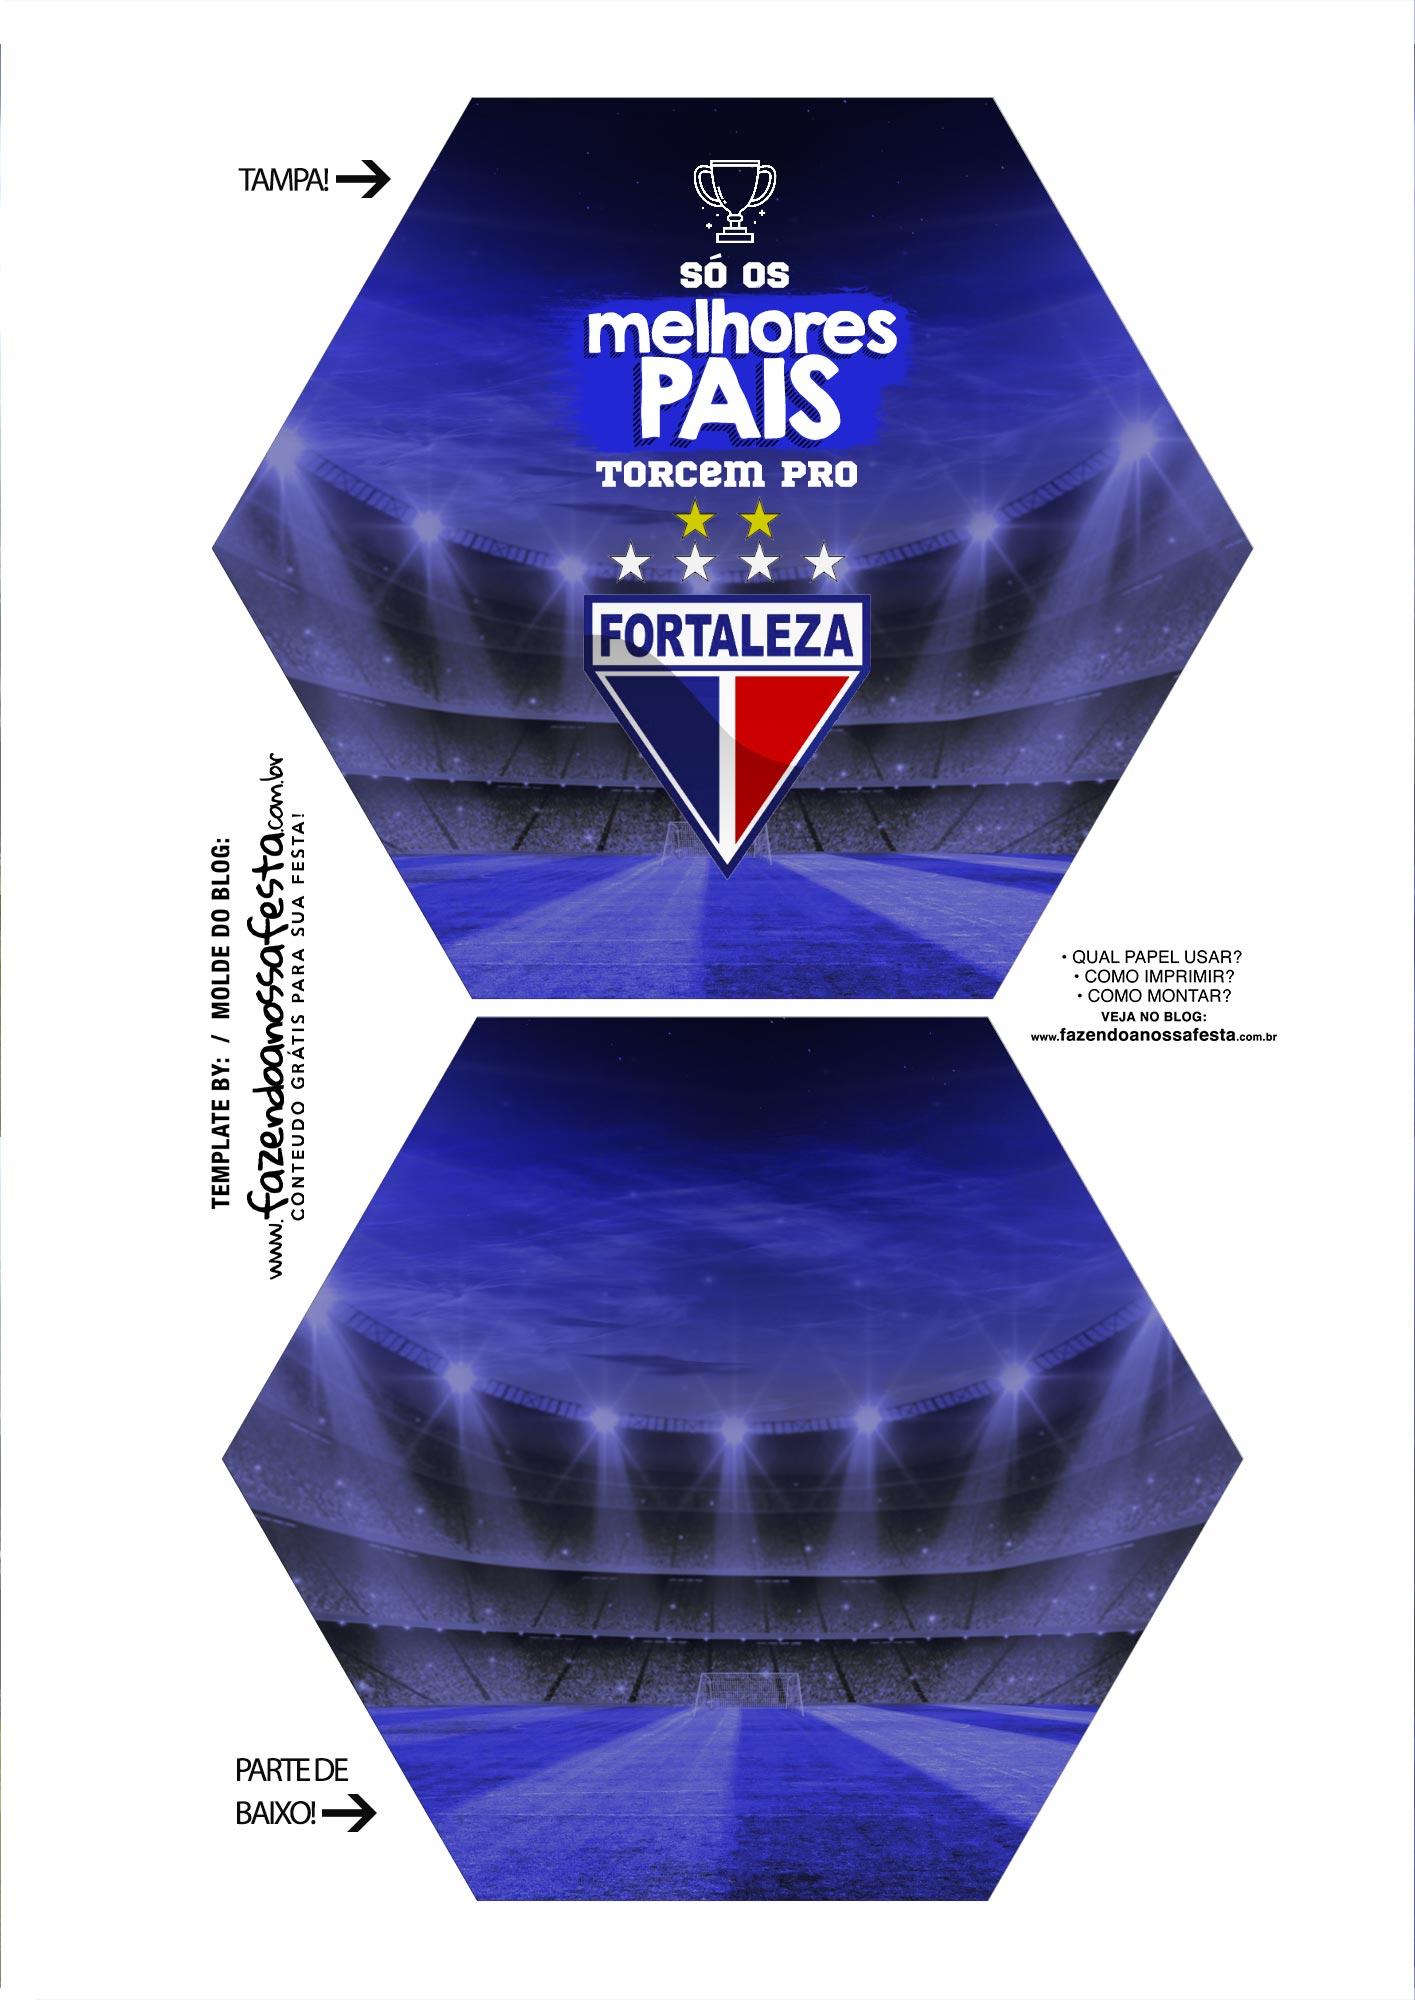 Caixa Explosao Times de Futebol Fortaleza Parte 1